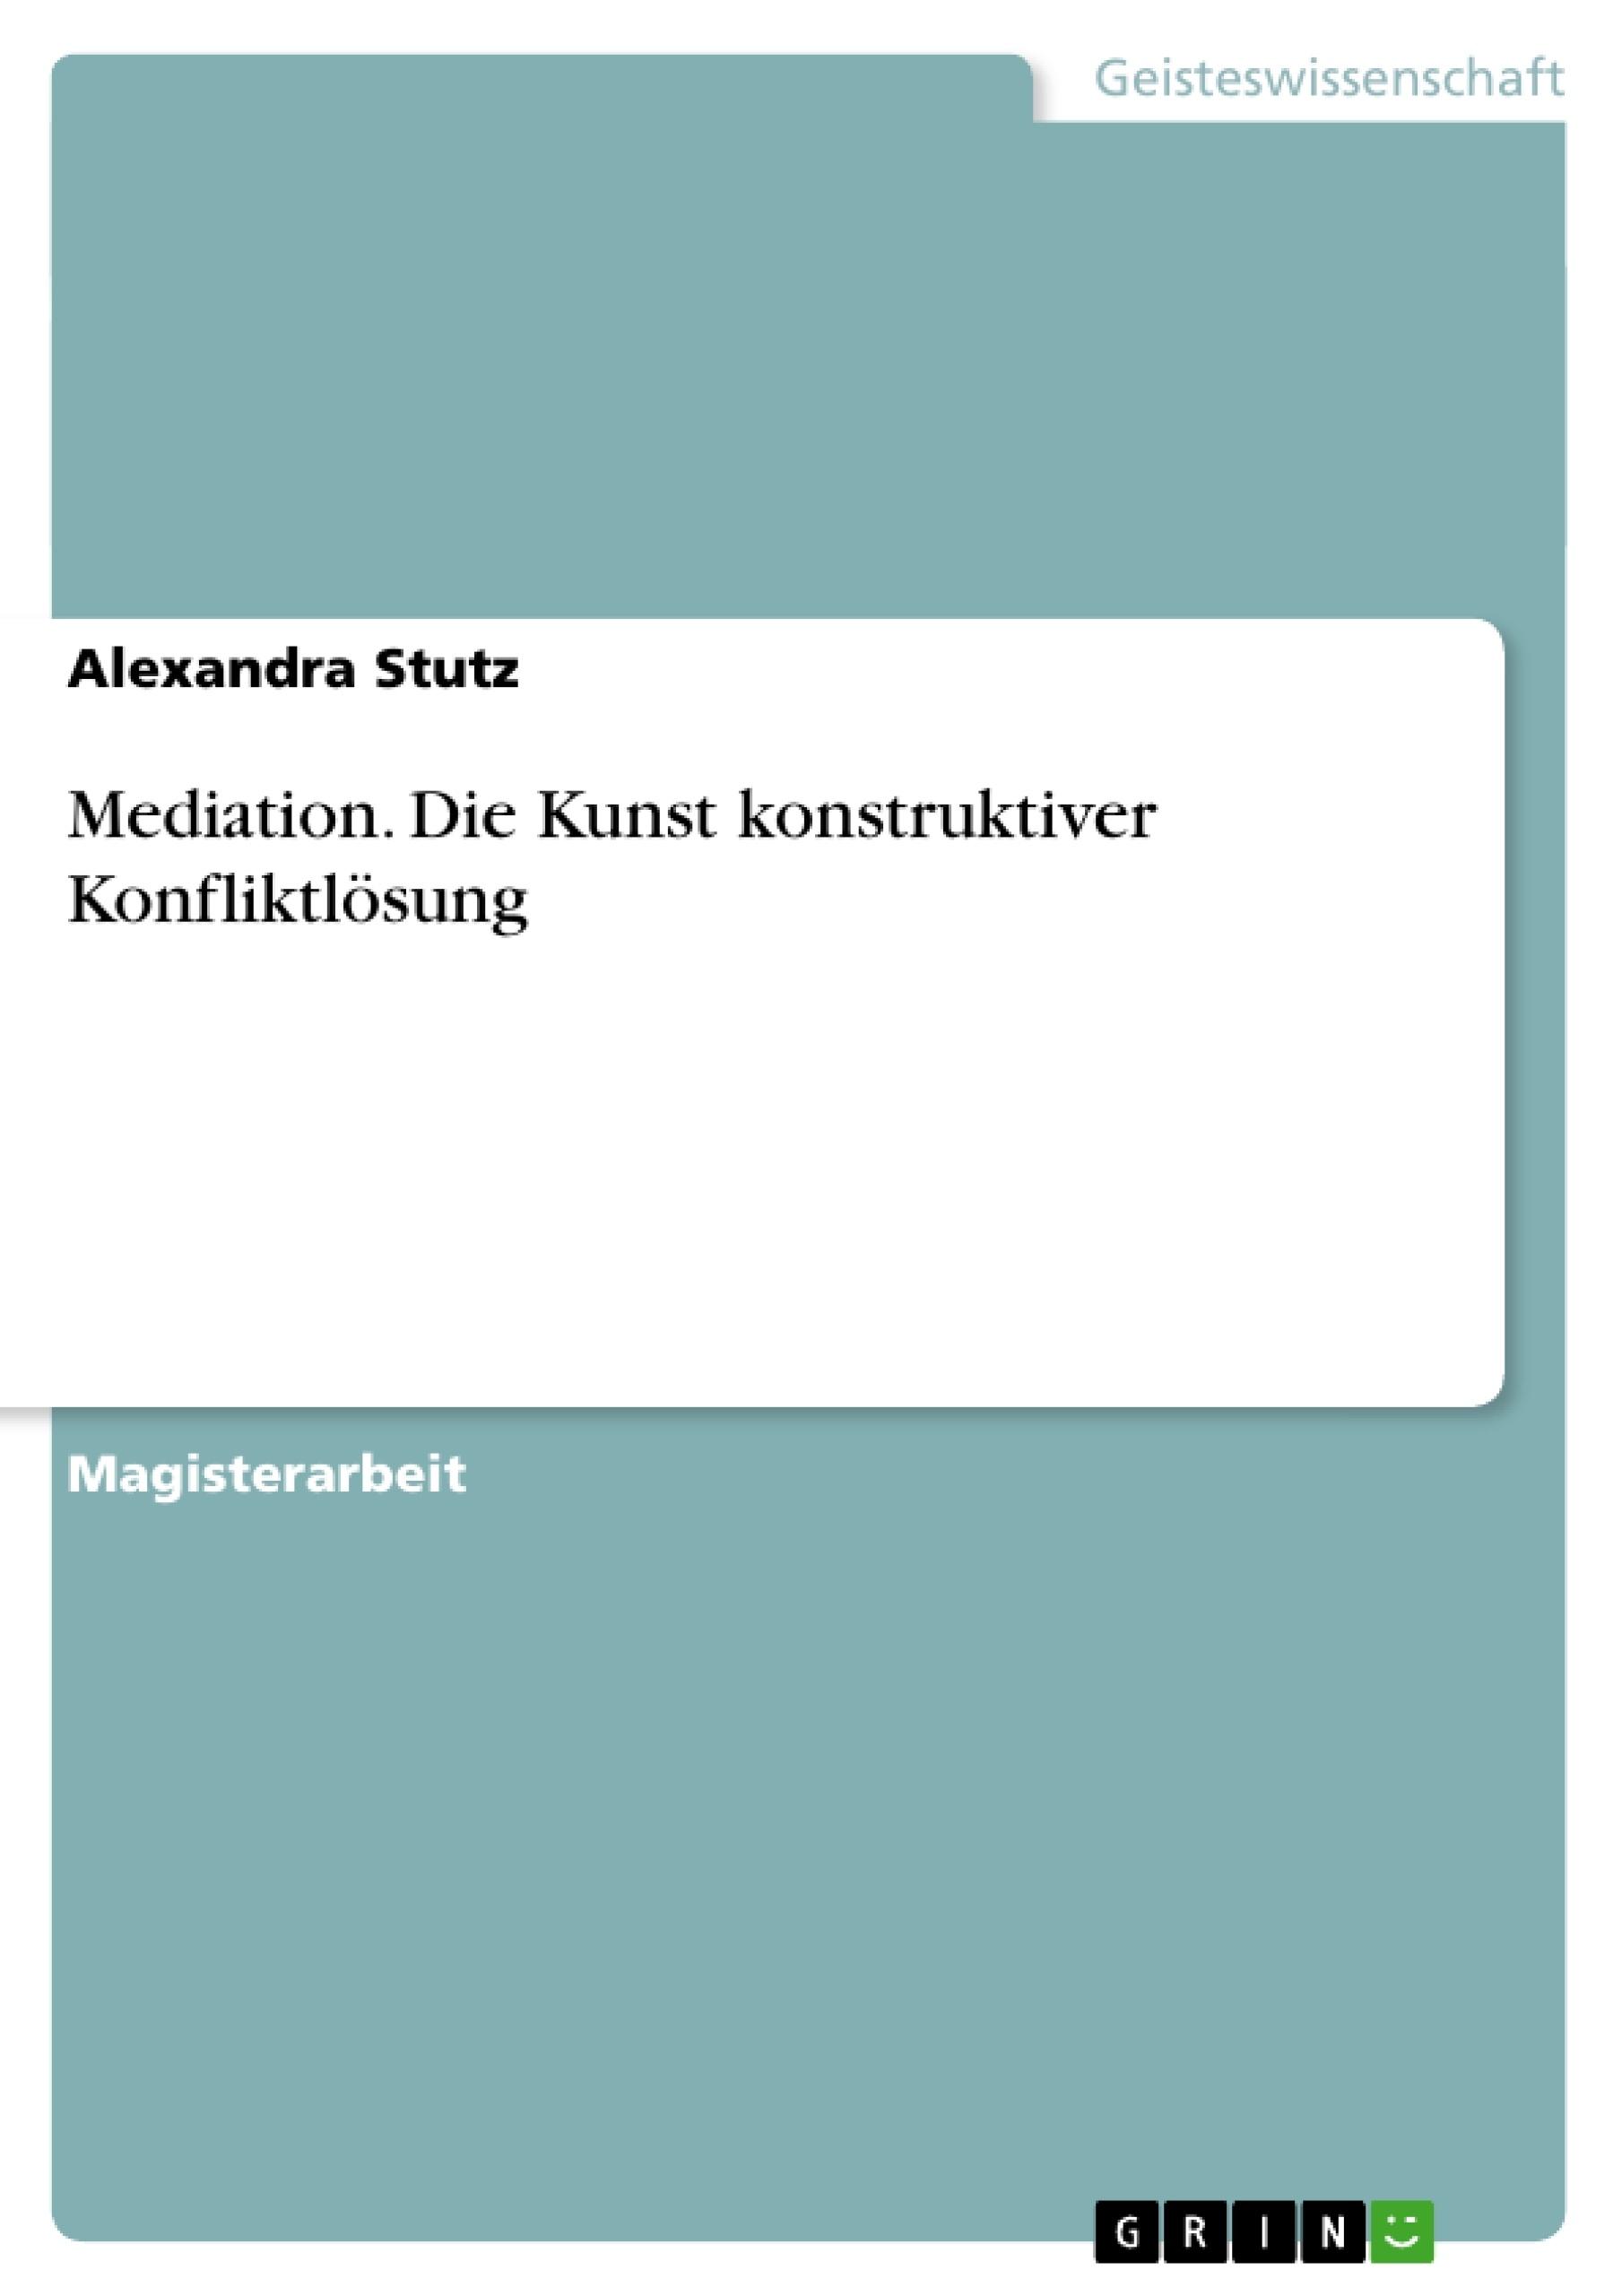 Titel: Mediation. Die Kunst konstruktiver Konfliktlösung